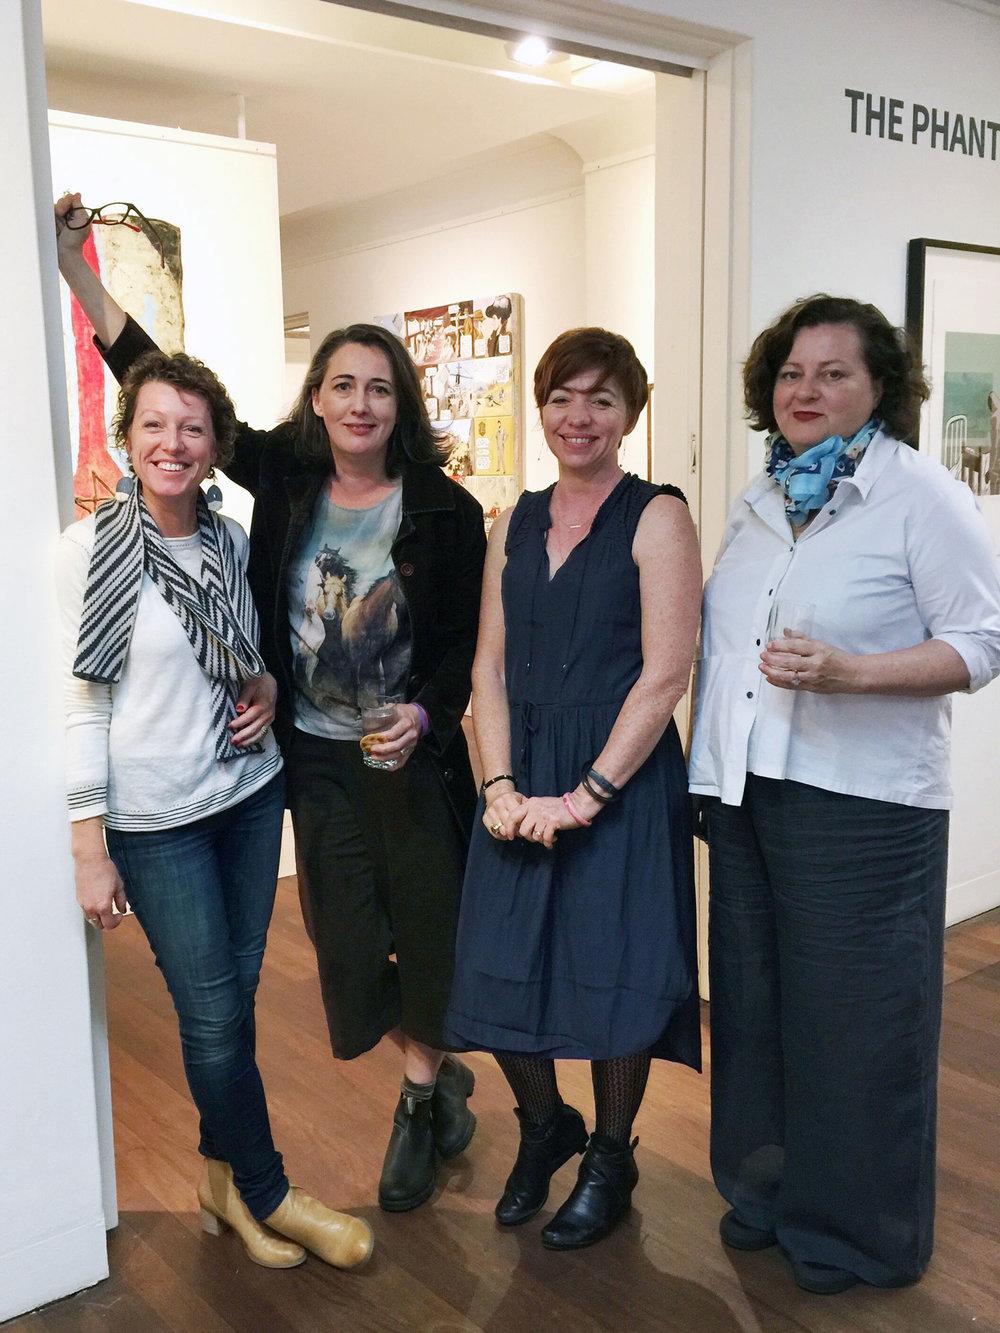 Fiona Chandler, Amy Kersey, Saffron Craig and Amanda Penrose